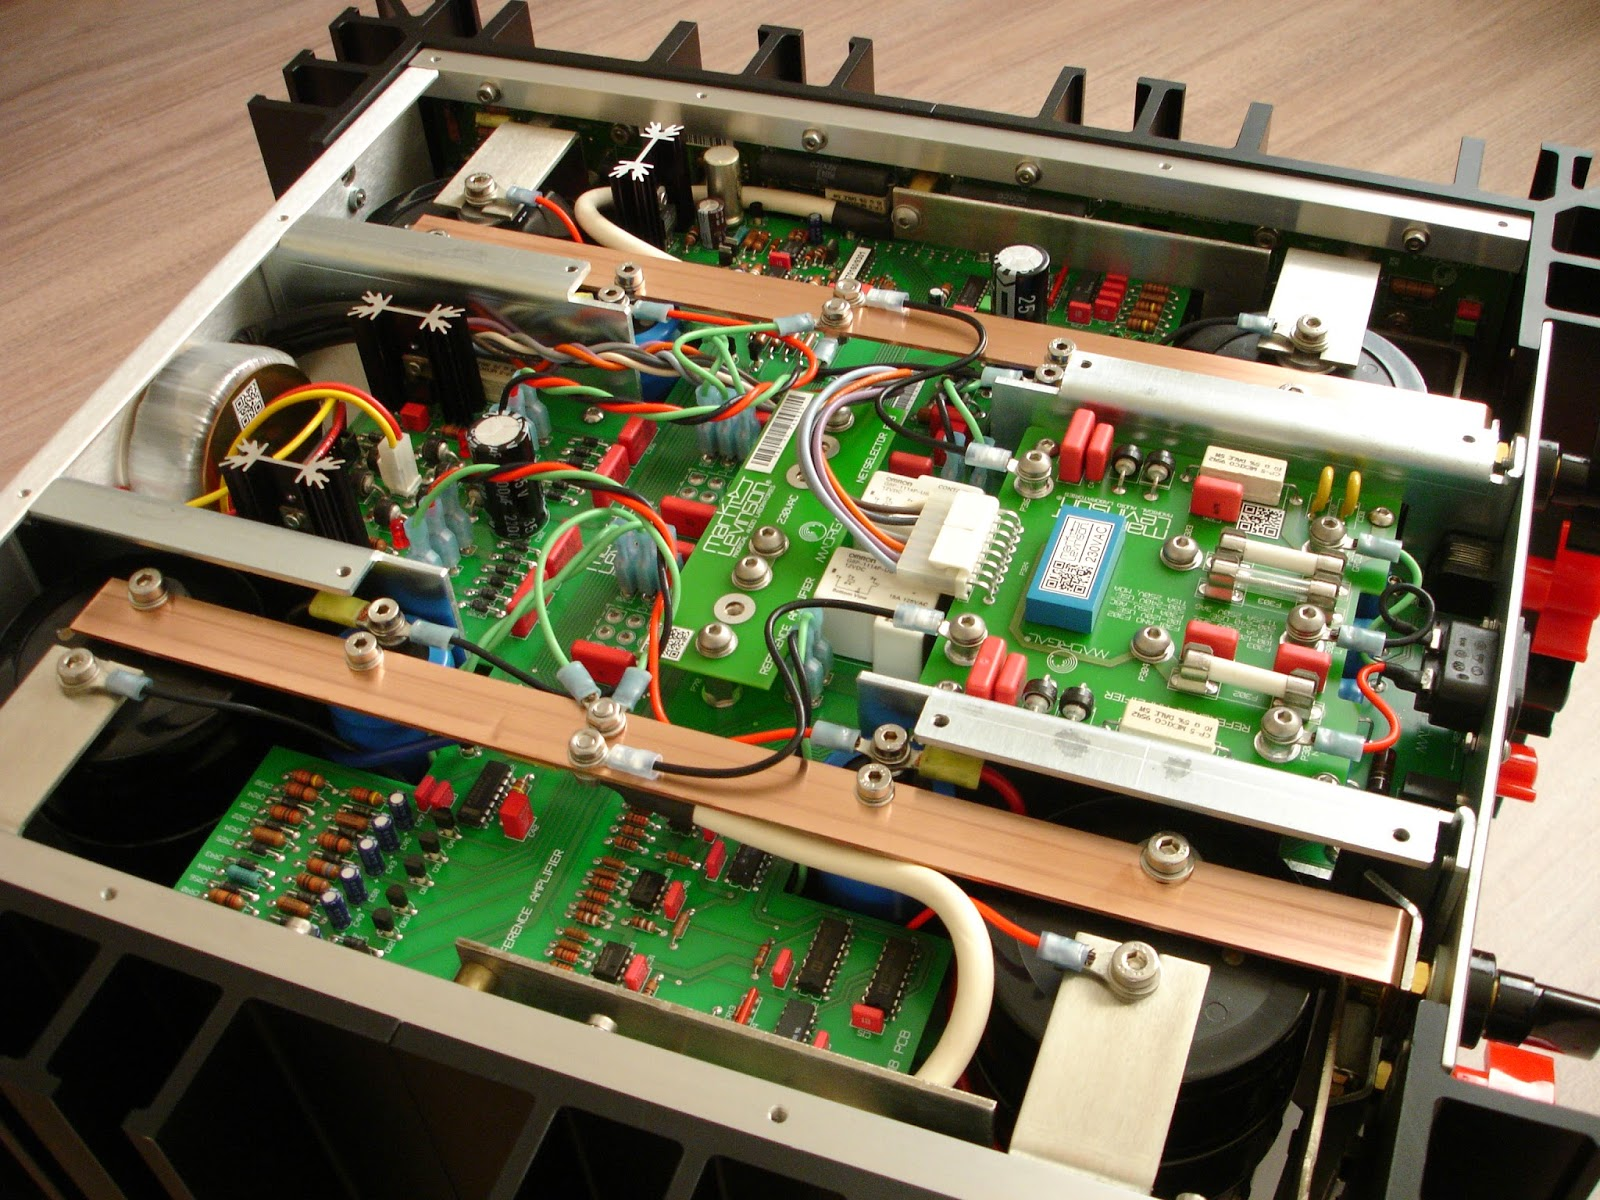 Mark Levinson No 331 stereo amp